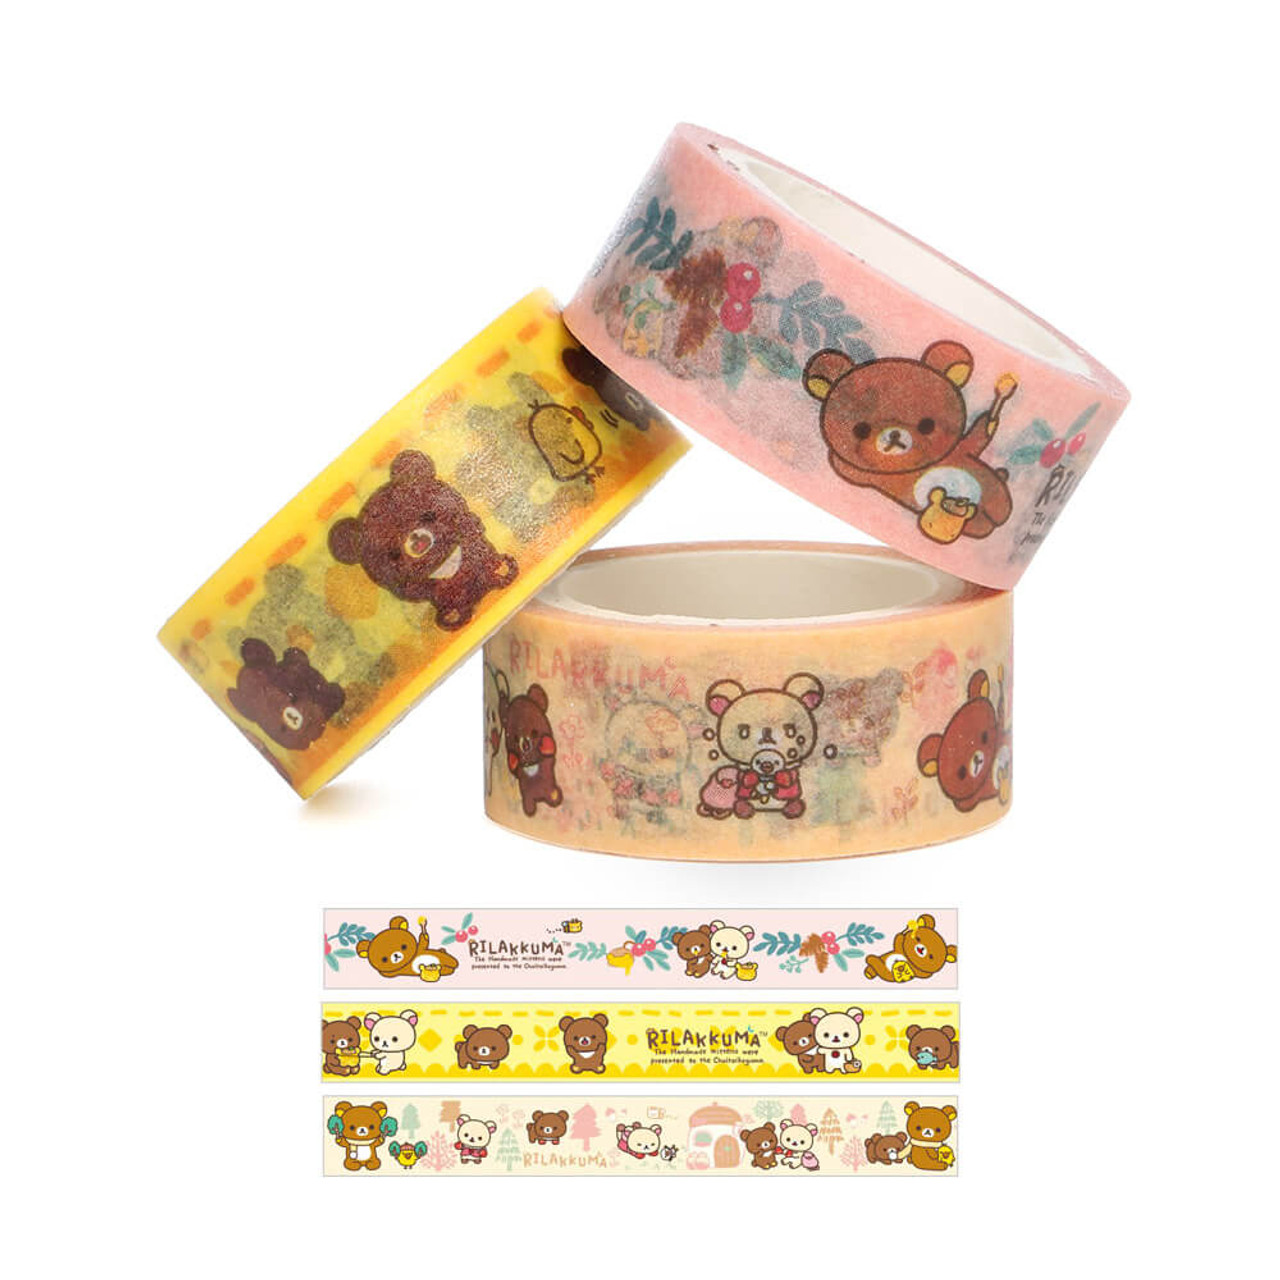 Rilakkuma Handmade Mittens Washi Tape - SE30802 ( Tapes )